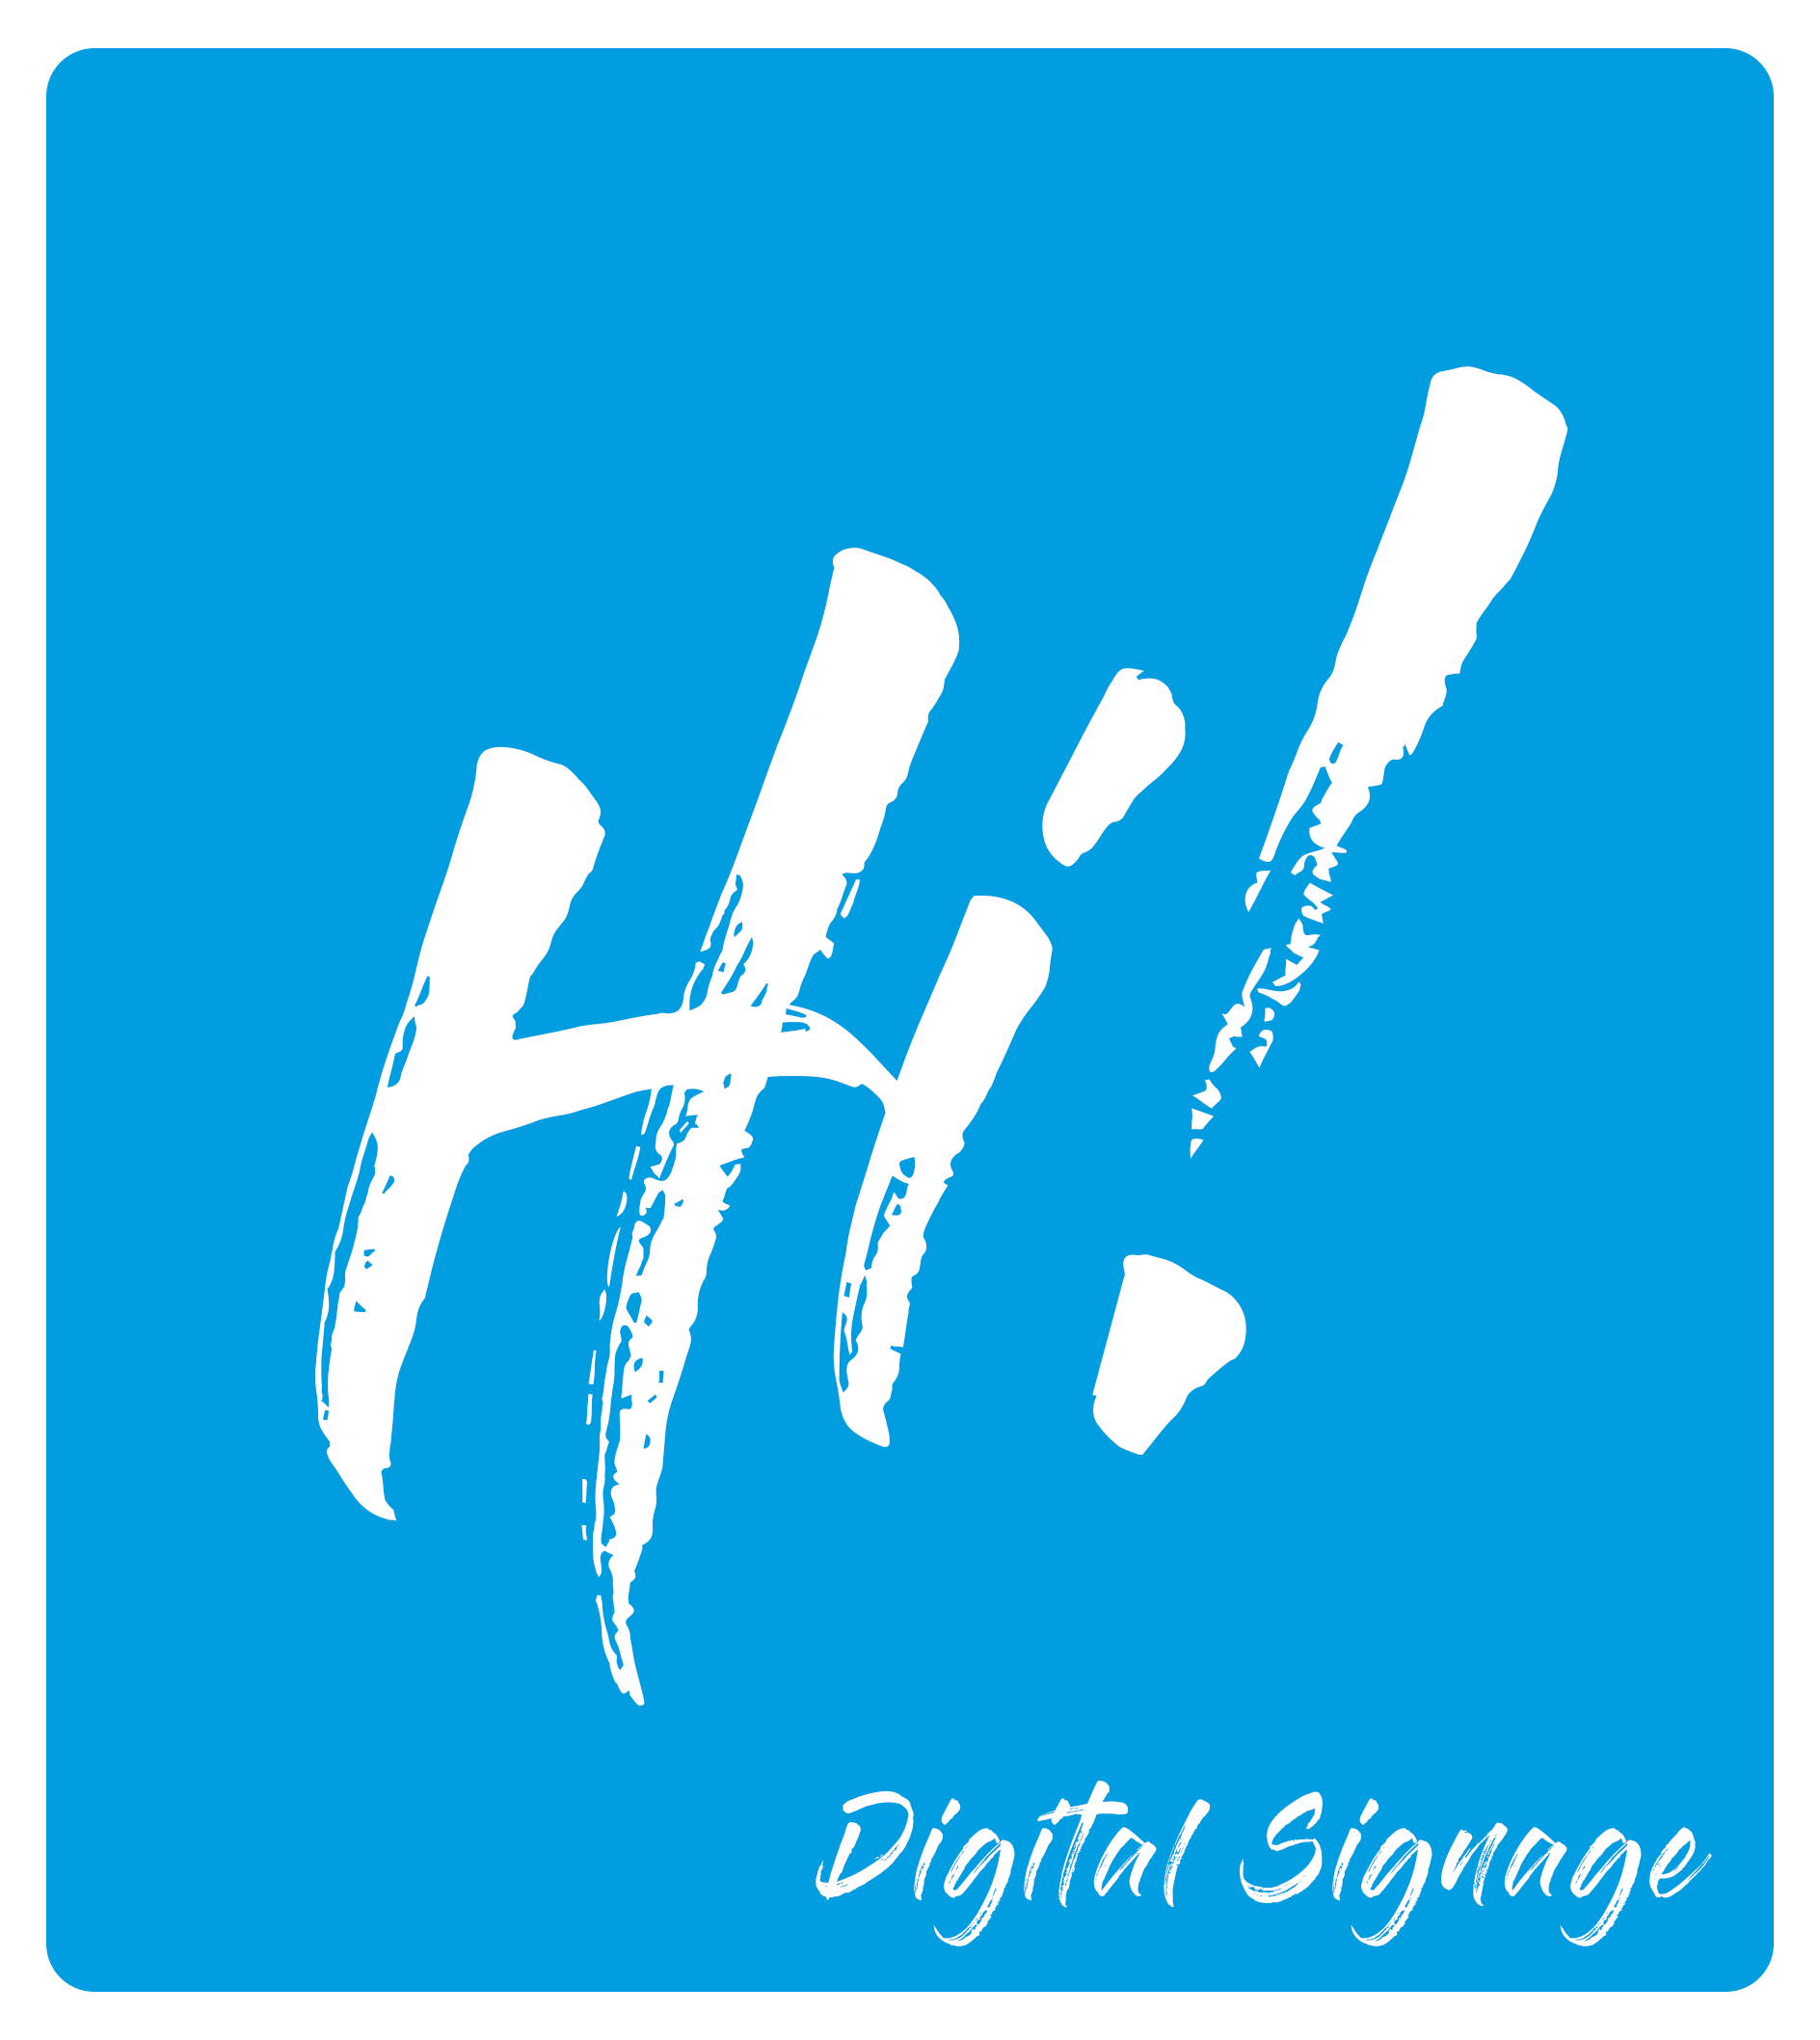 Hi! Digital Signage